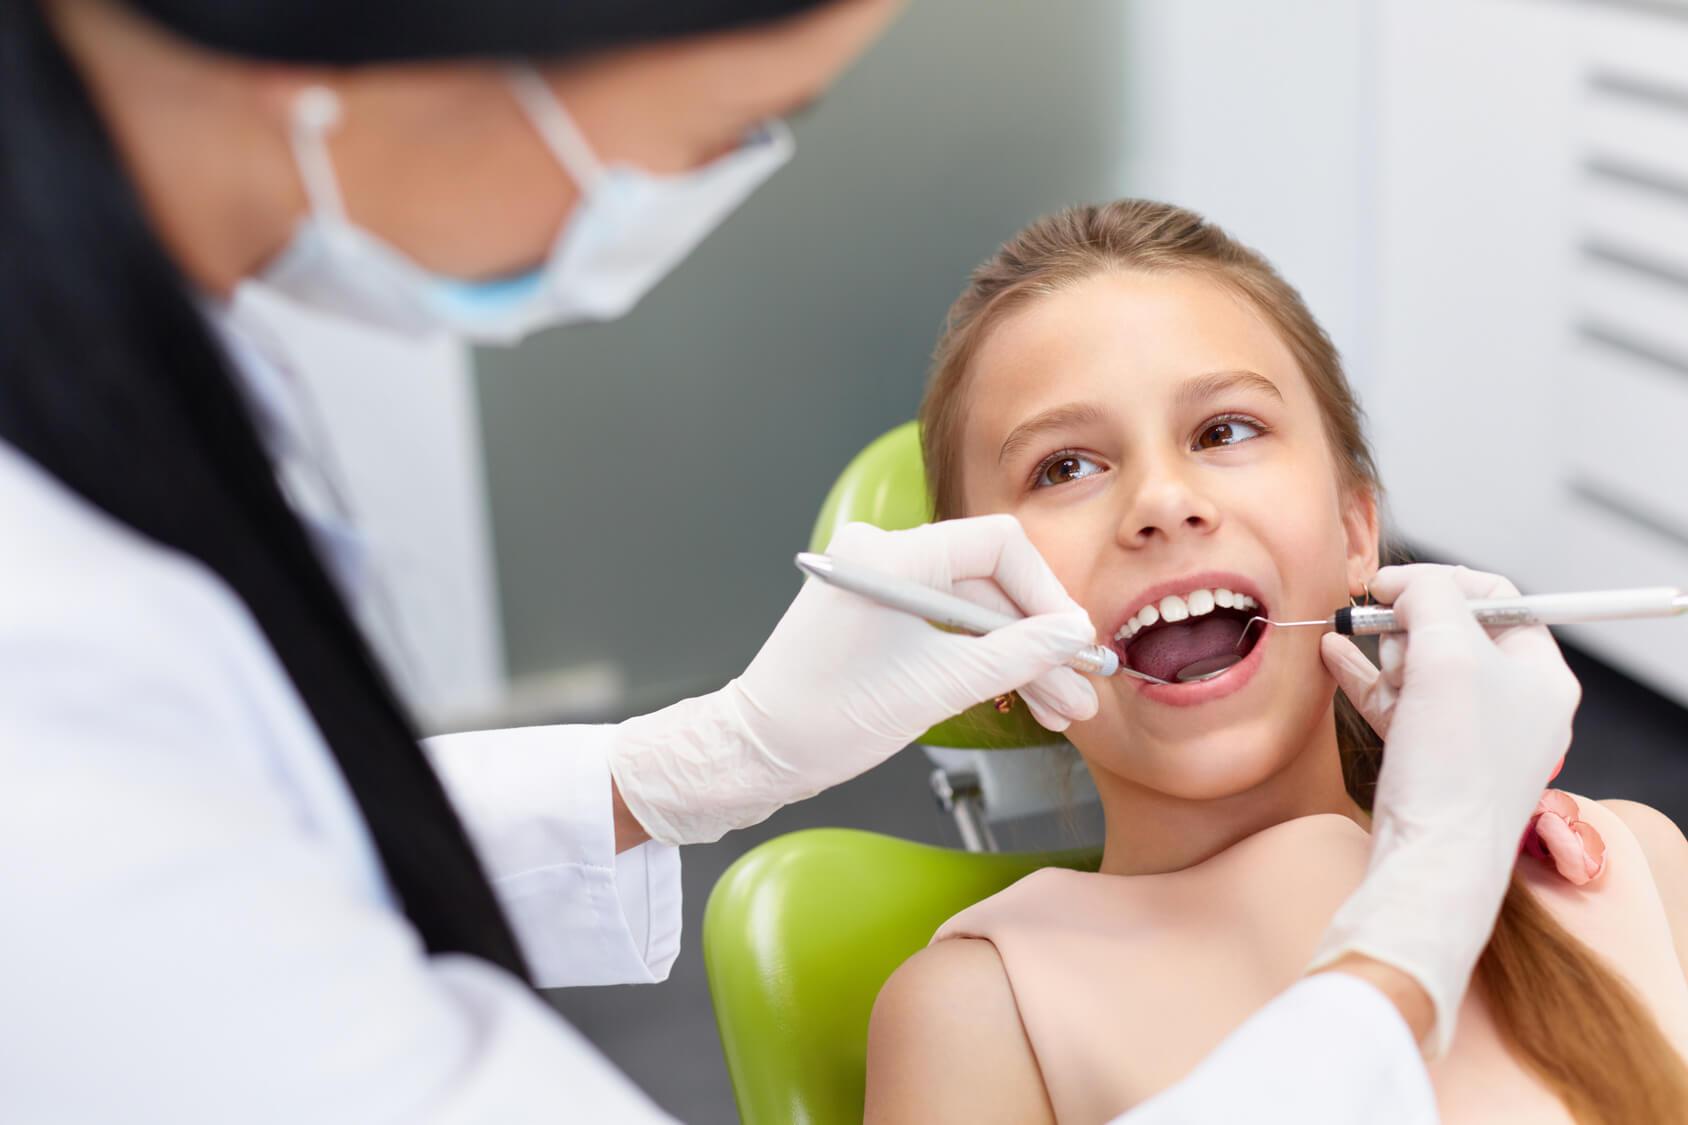 NHS child treatment